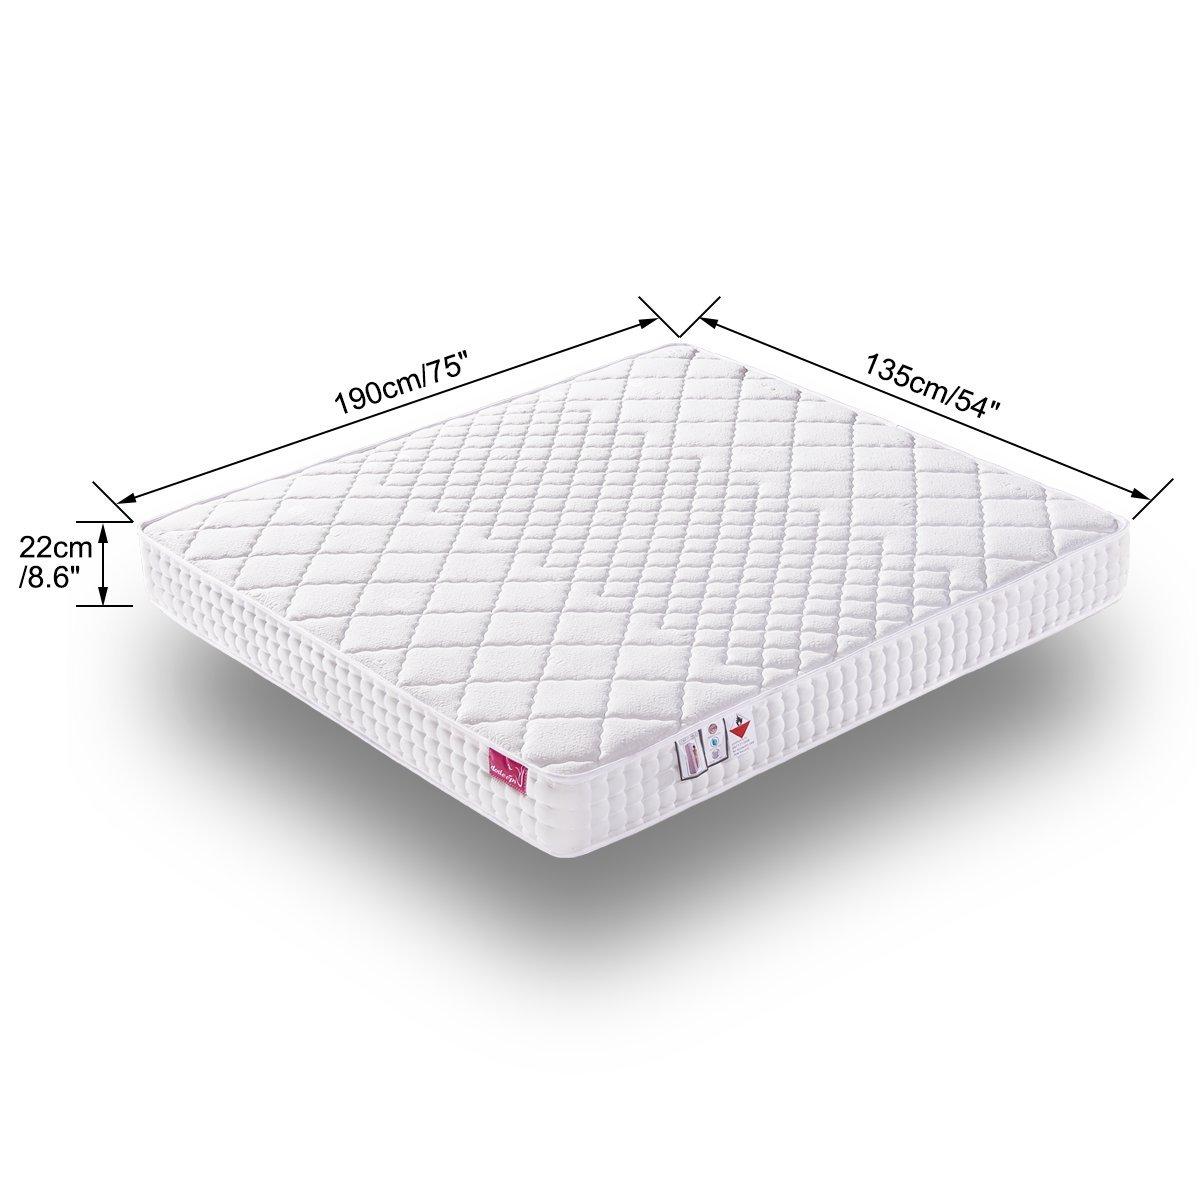 DOSLEEPS Doble colchón 4FT6 9-Zone Colchón de muelles ensacados con espuma de memoria y tela tencel - Colchón ortopédico - Grosor: 8.7 pulgadas, ...